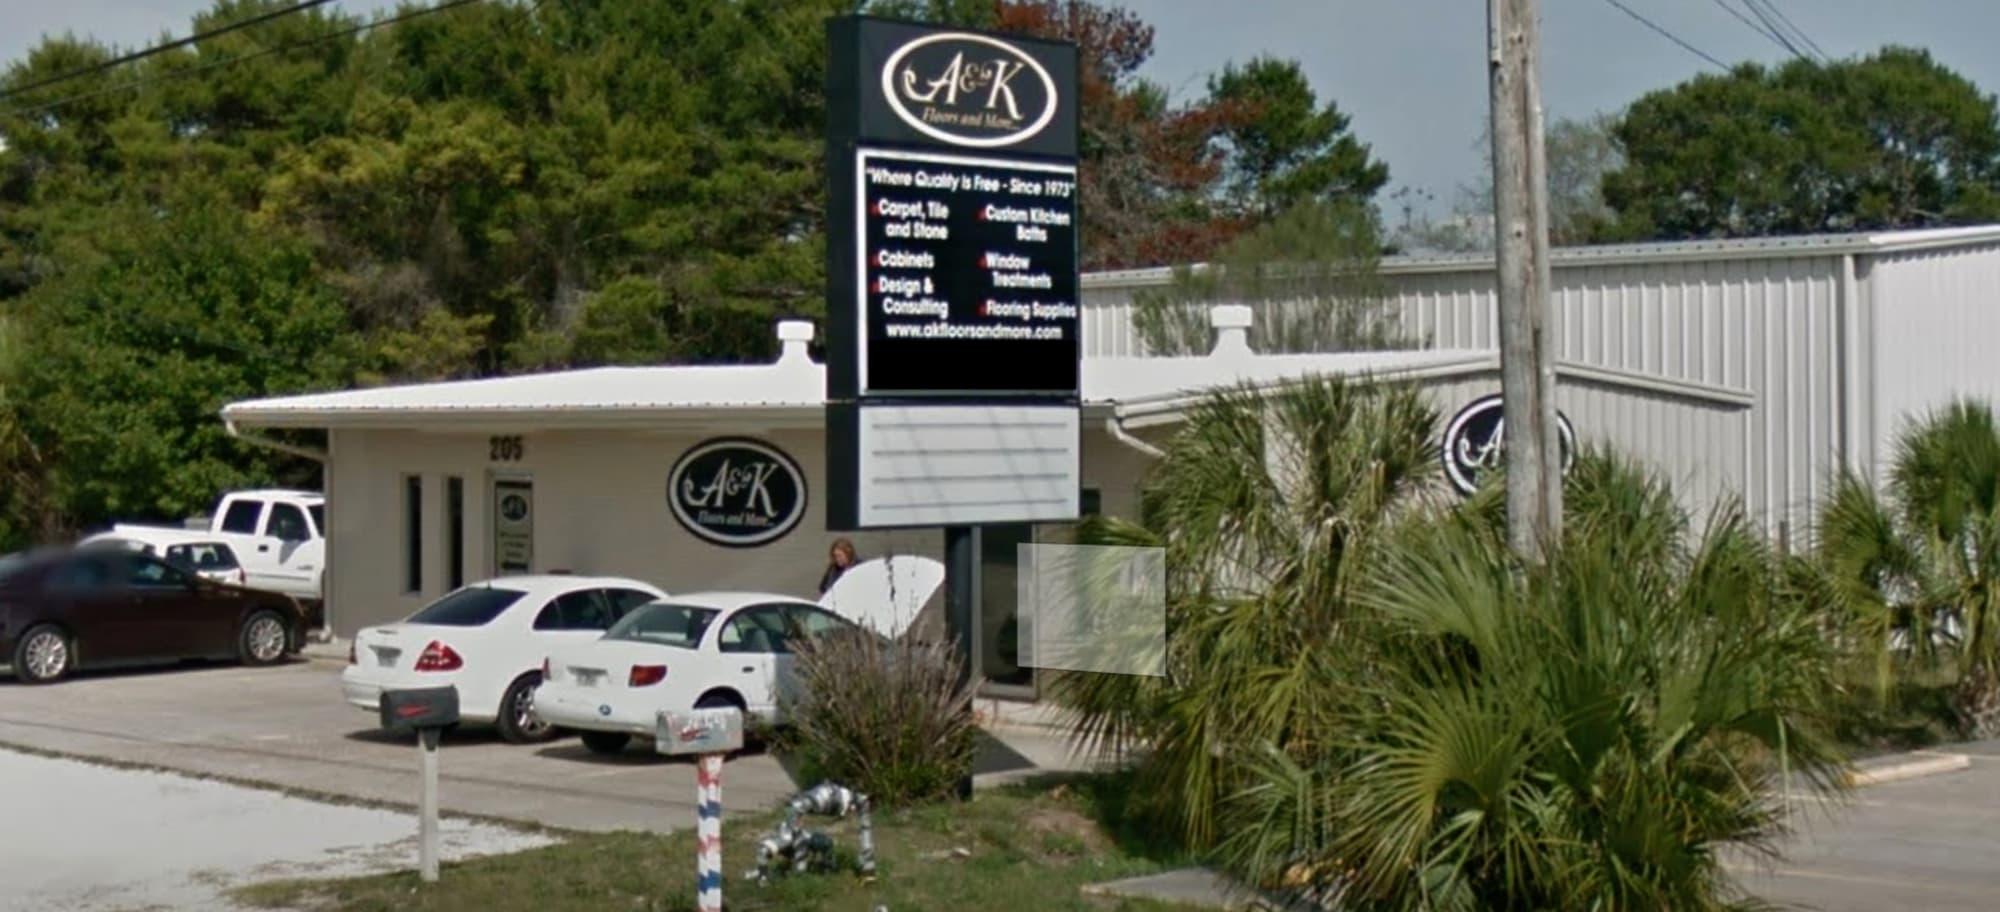 A & K Floors & More - 205 FL-79 Panama City, FL 32413